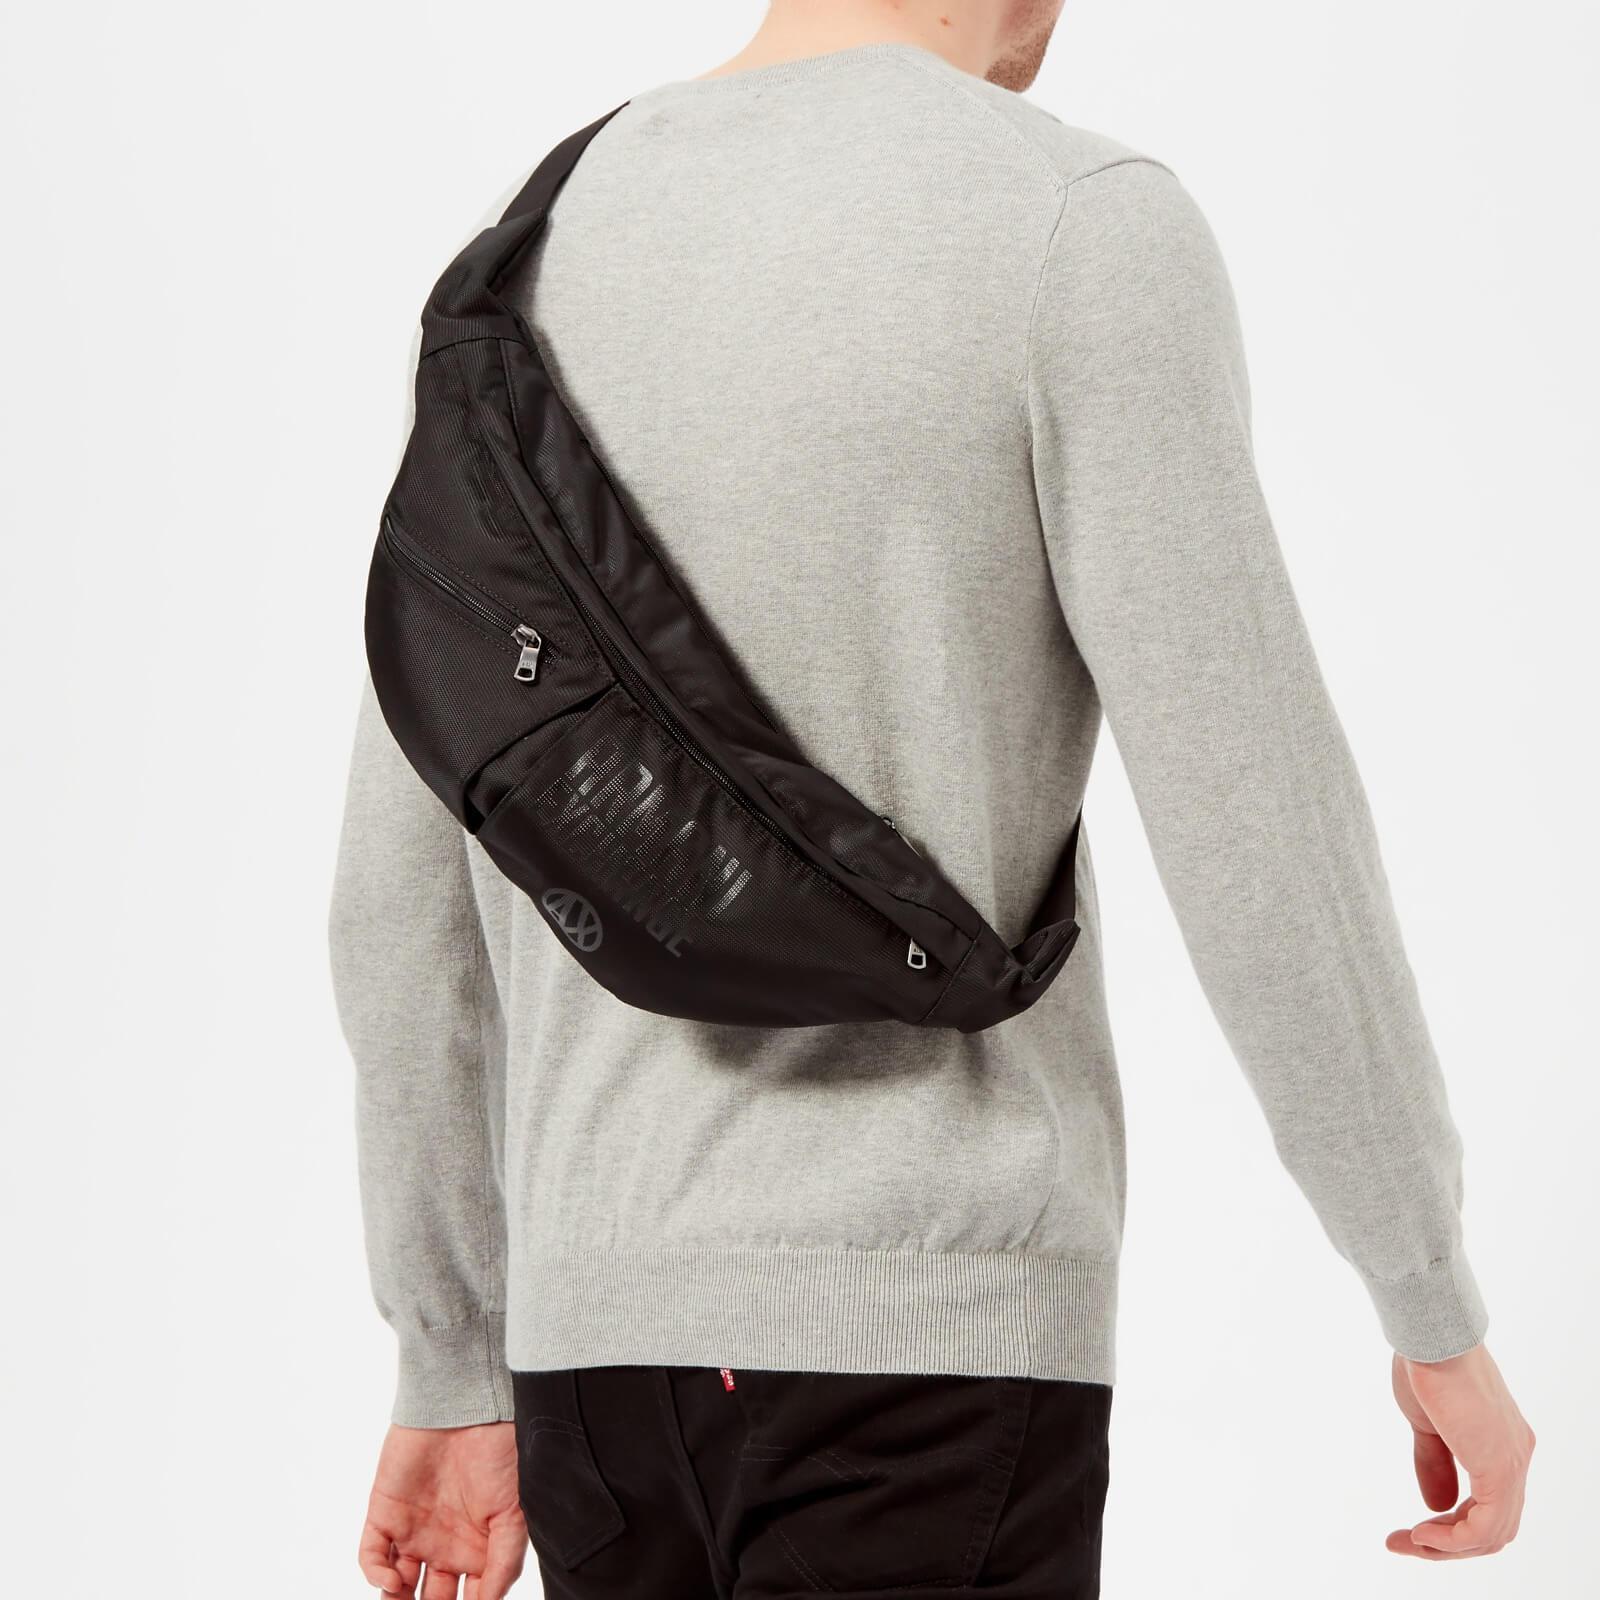 5b9a1f6bc6e1 Lyst - Armani Exchange Nylon Sling Bag in Black for Men